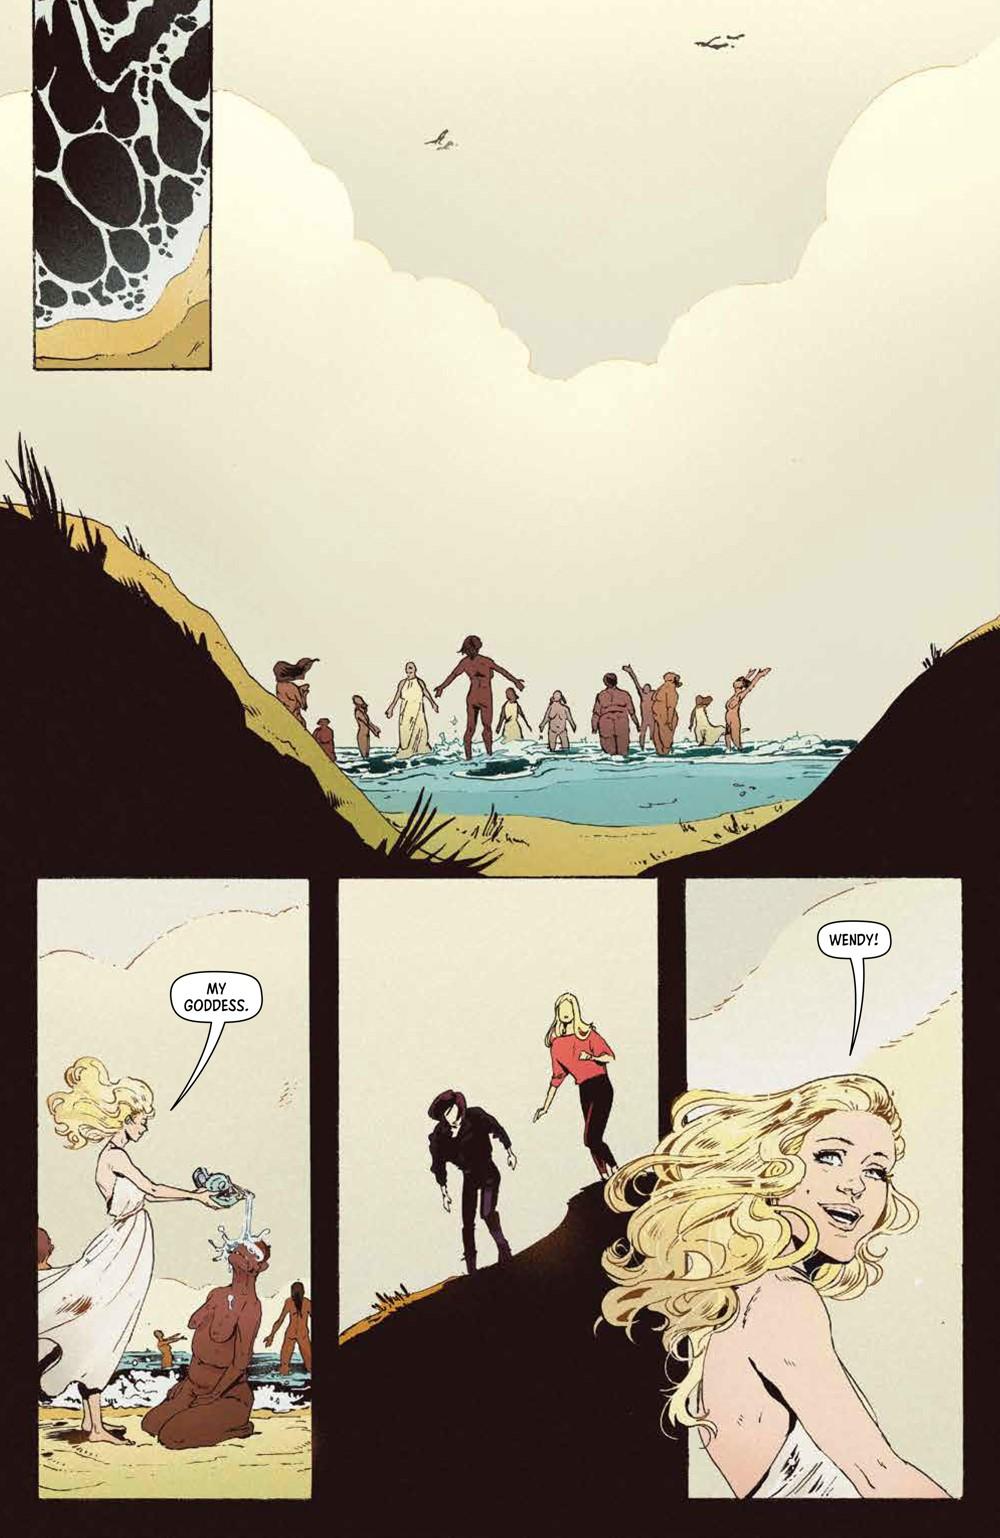 Maw_001_PRESS_8 ComicList Previews: MAW #1 (OF 5)